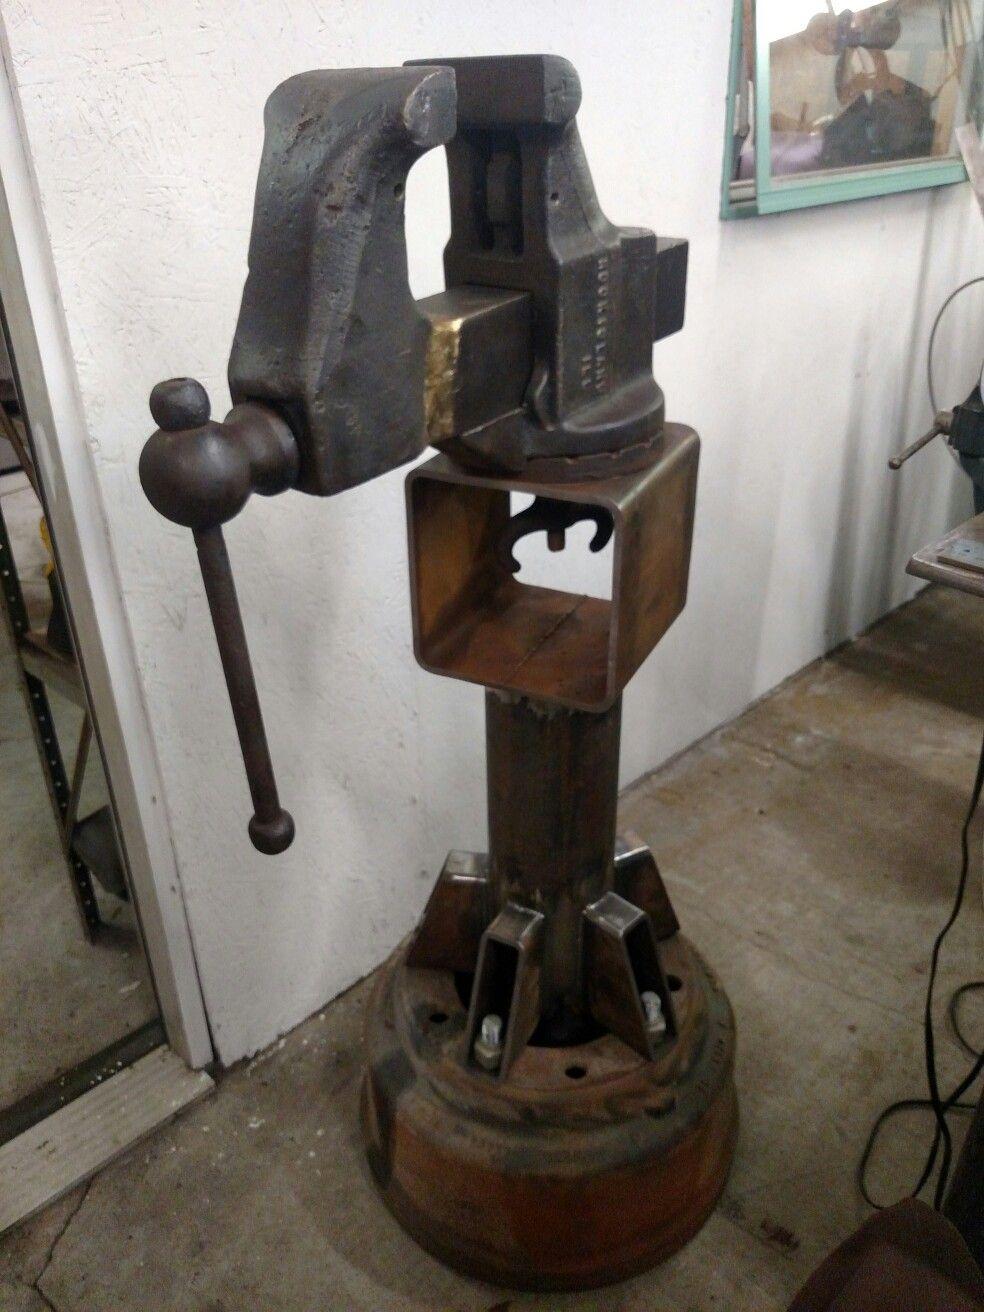 Vintage Rock Island Vise Welding Fabrication Tig Home